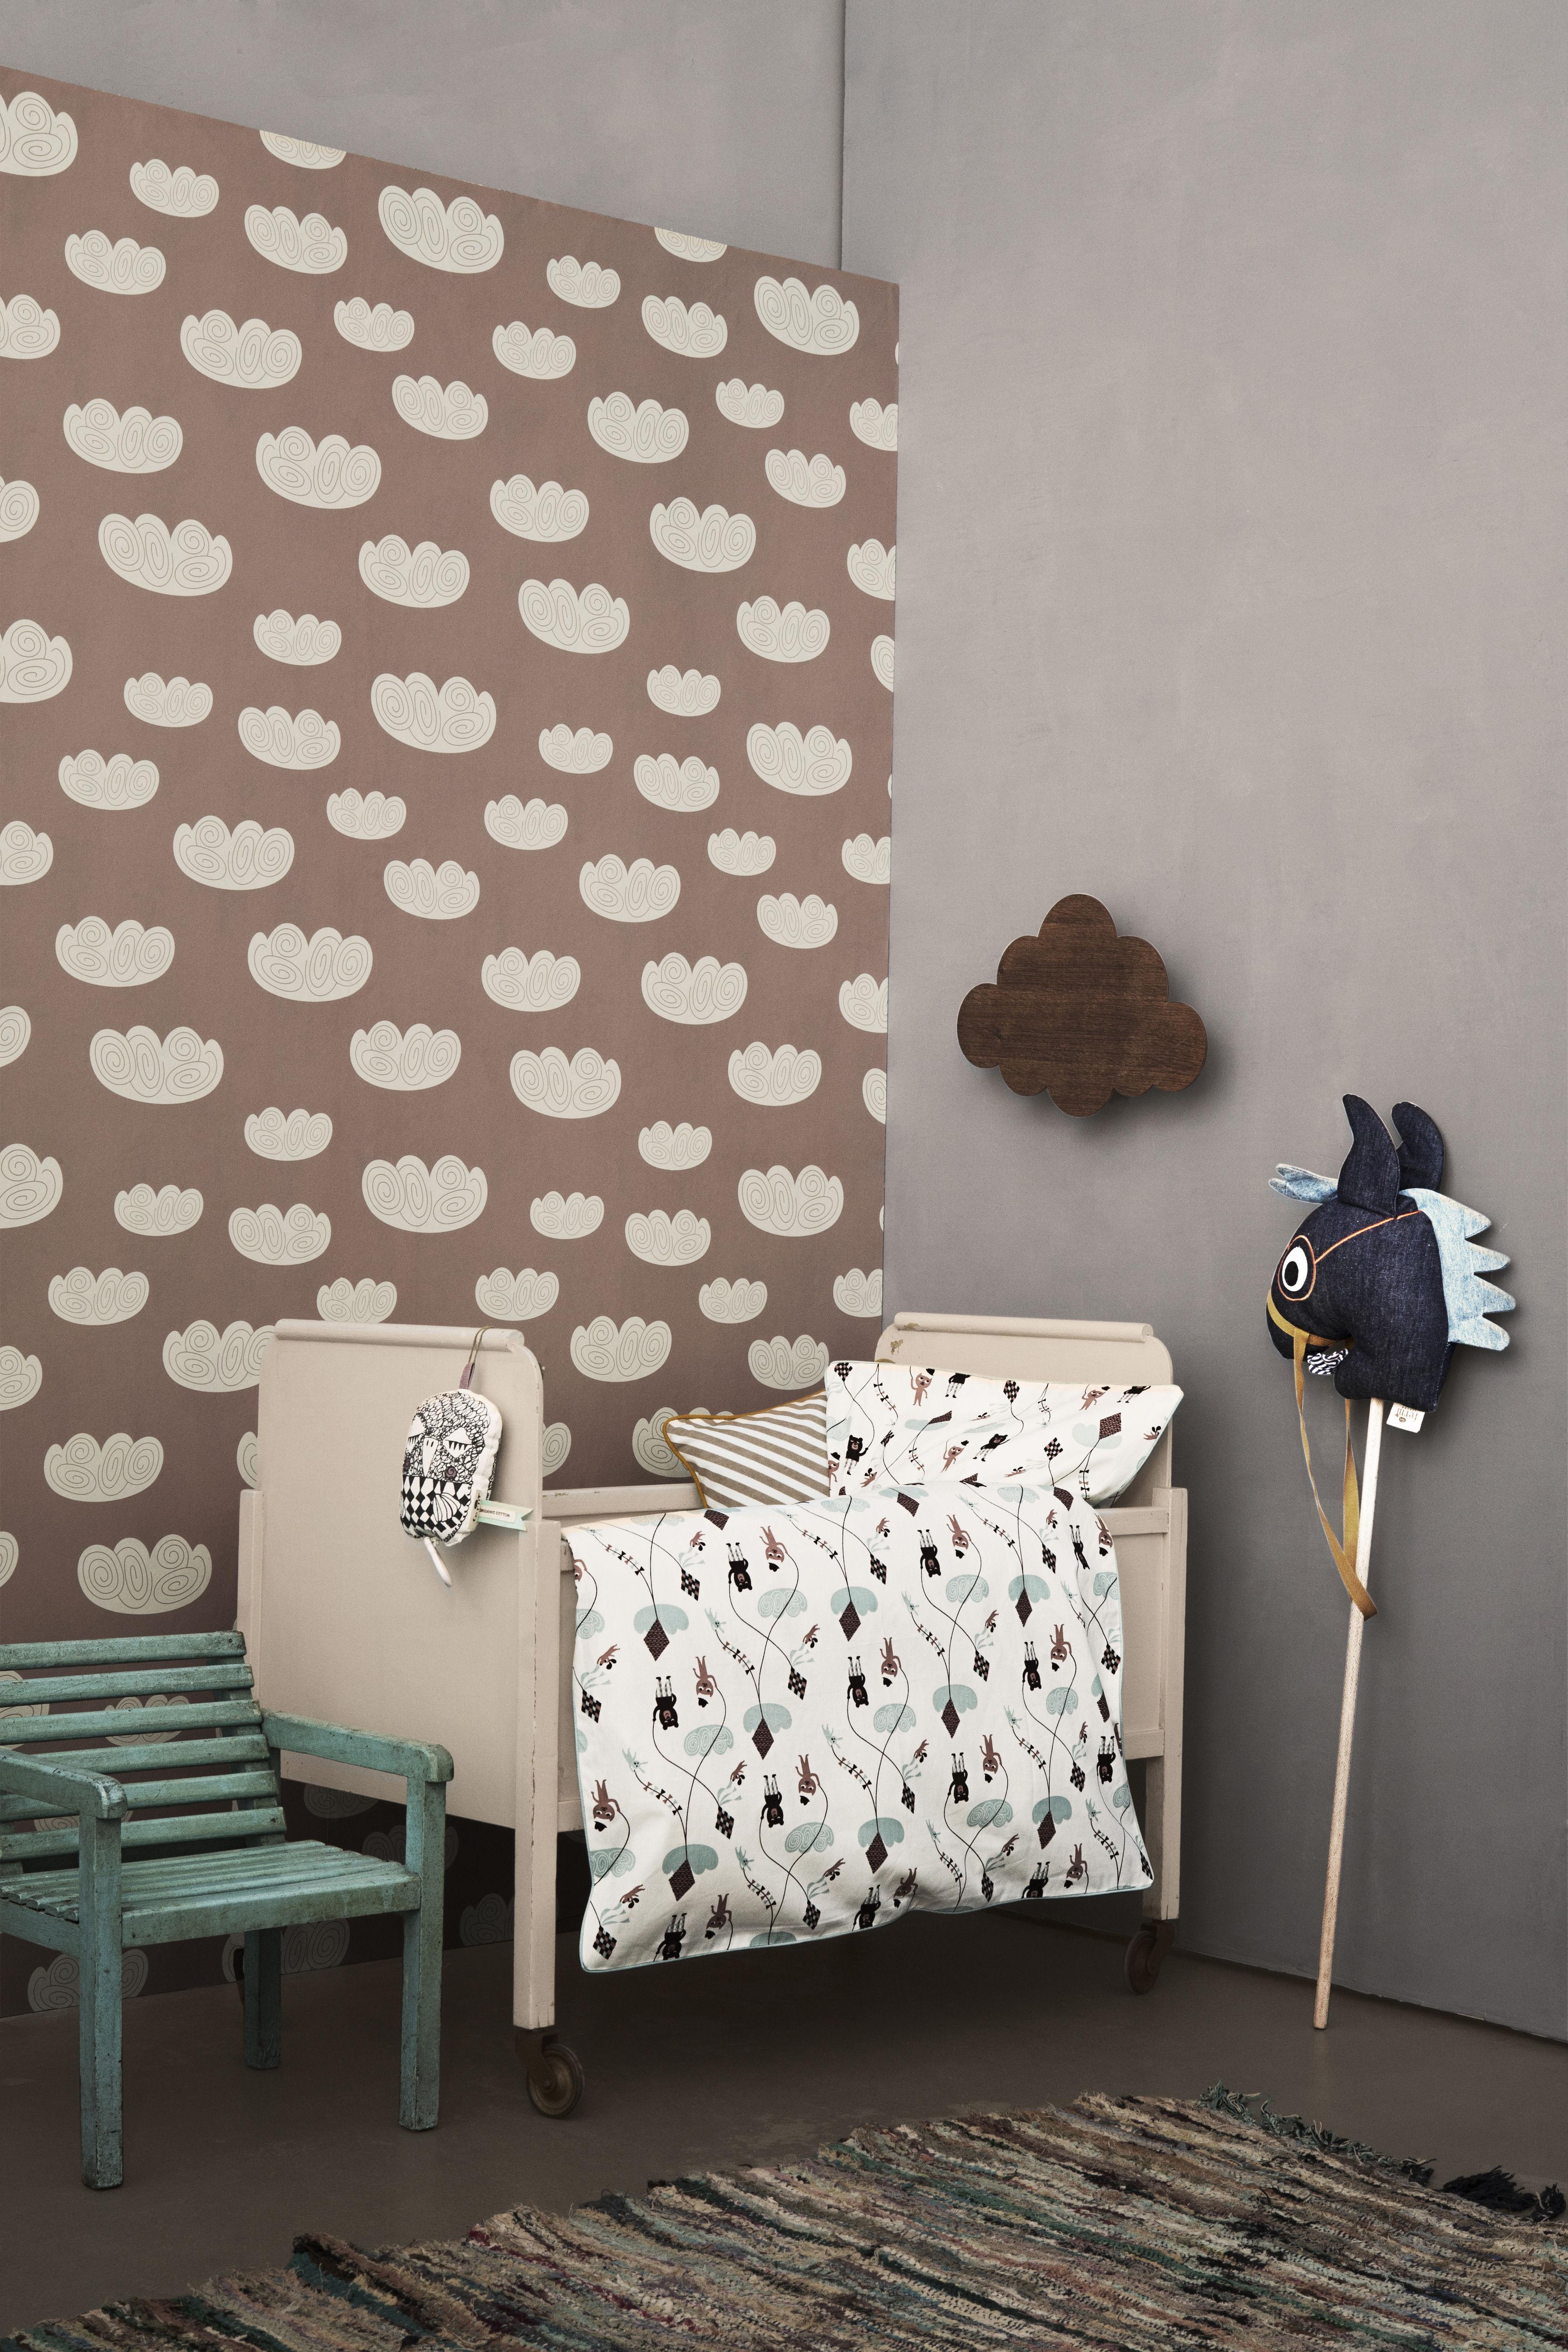 cloud 1 bahn b 53 cm ferm living tapete. Black Bedroom Furniture Sets. Home Design Ideas